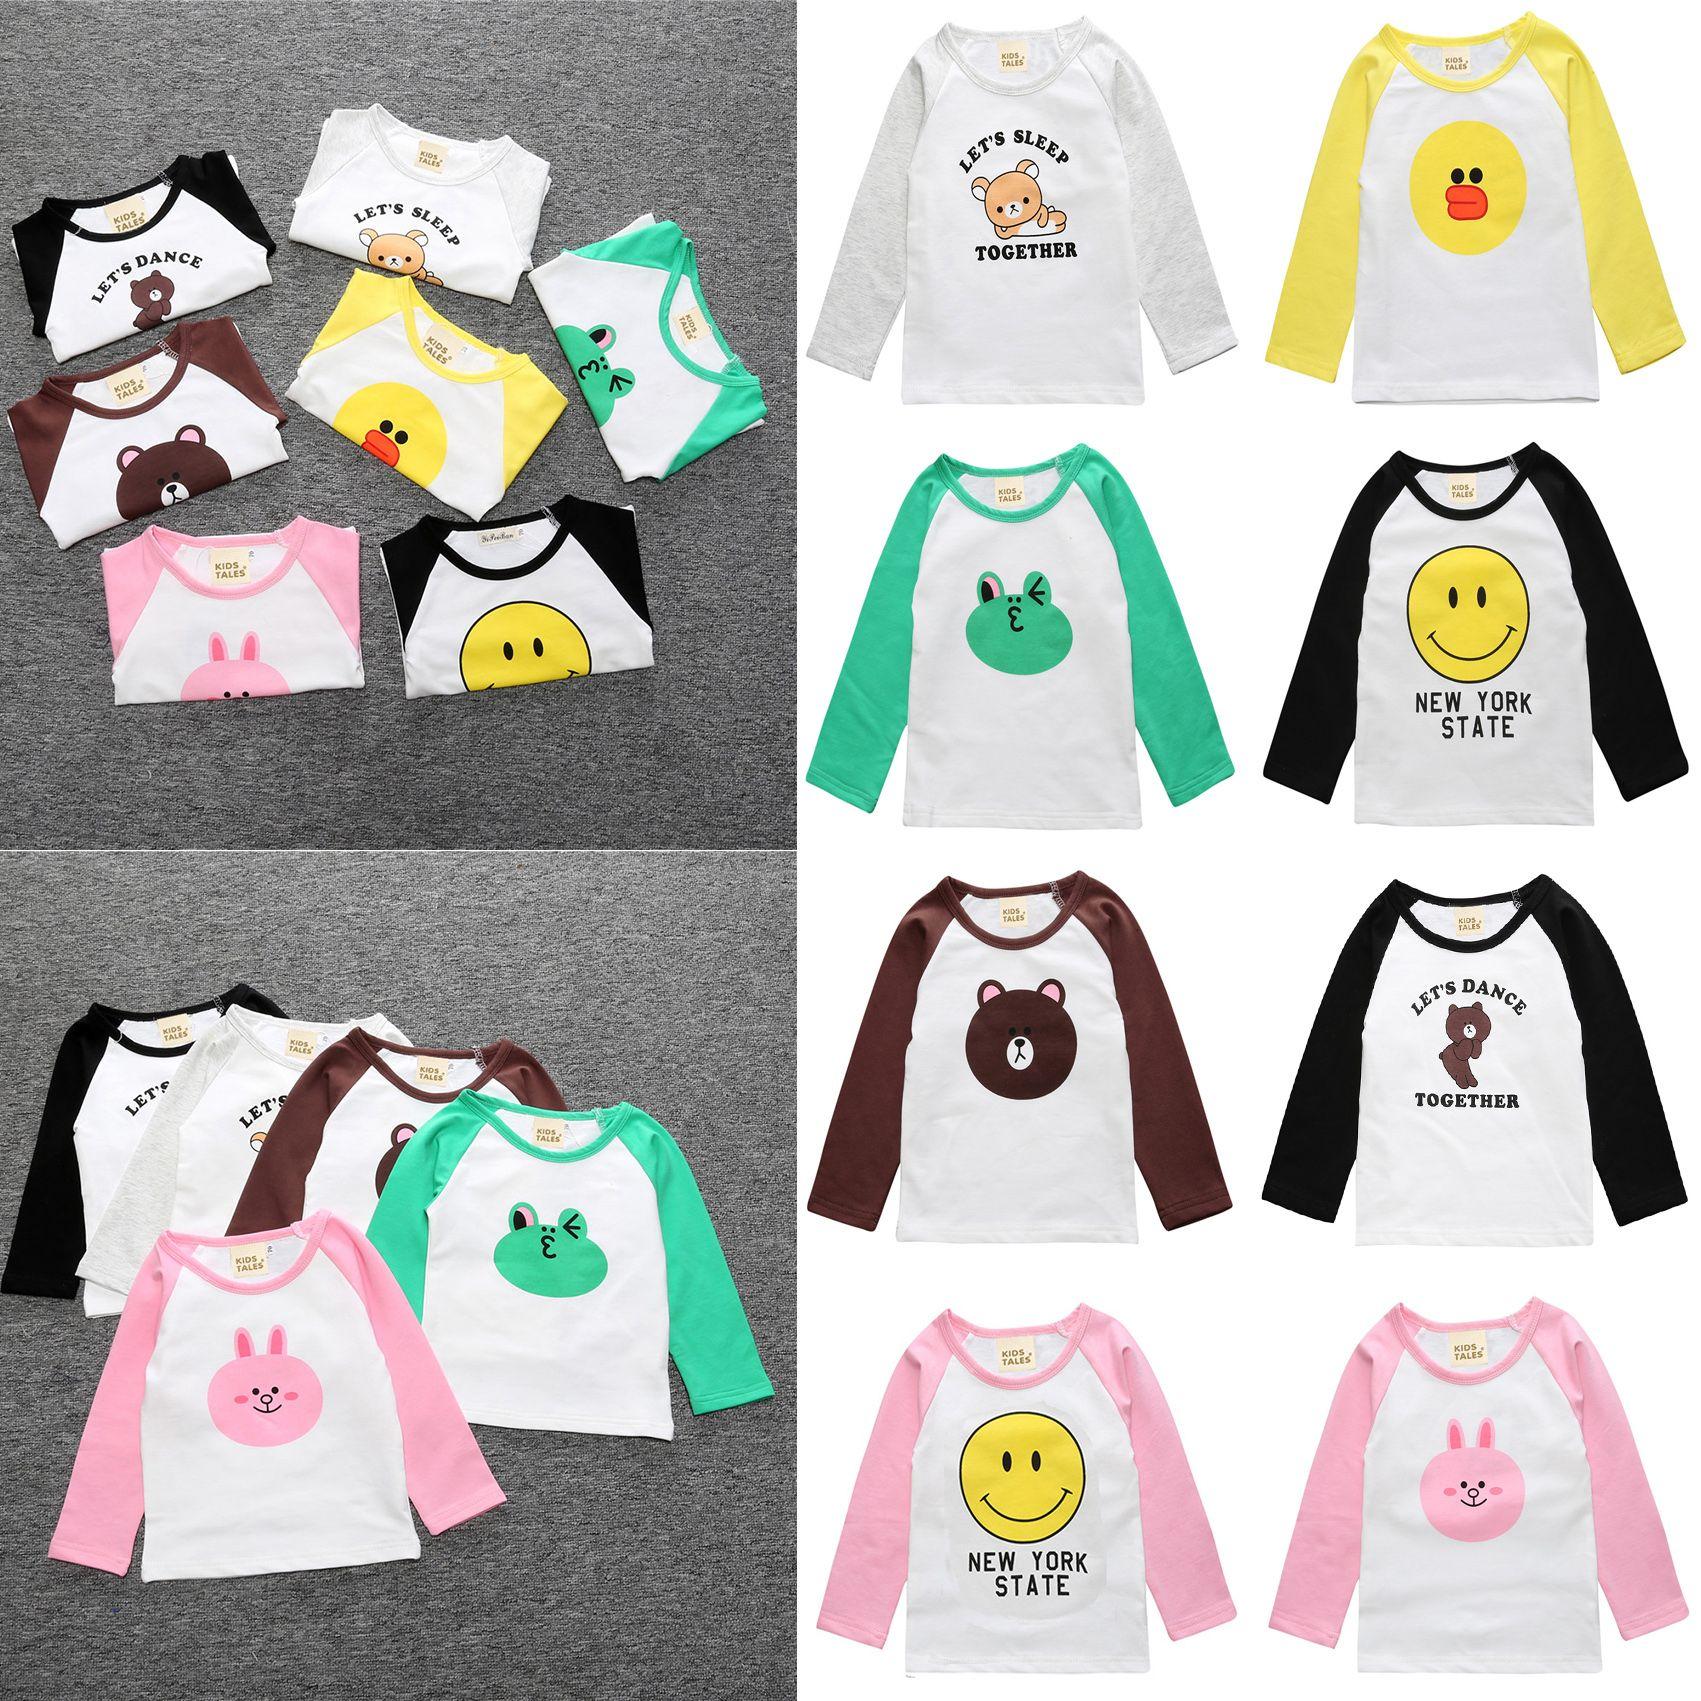 33c1738b8 2019 Kids Cute T Shirt Cotton Cheap Baby Clothes Boy Girl Kids Raglan  Printed Fashion T Shirt Girls Boys Long Sleeve Tops 17072901 From  Smartgrass, ...